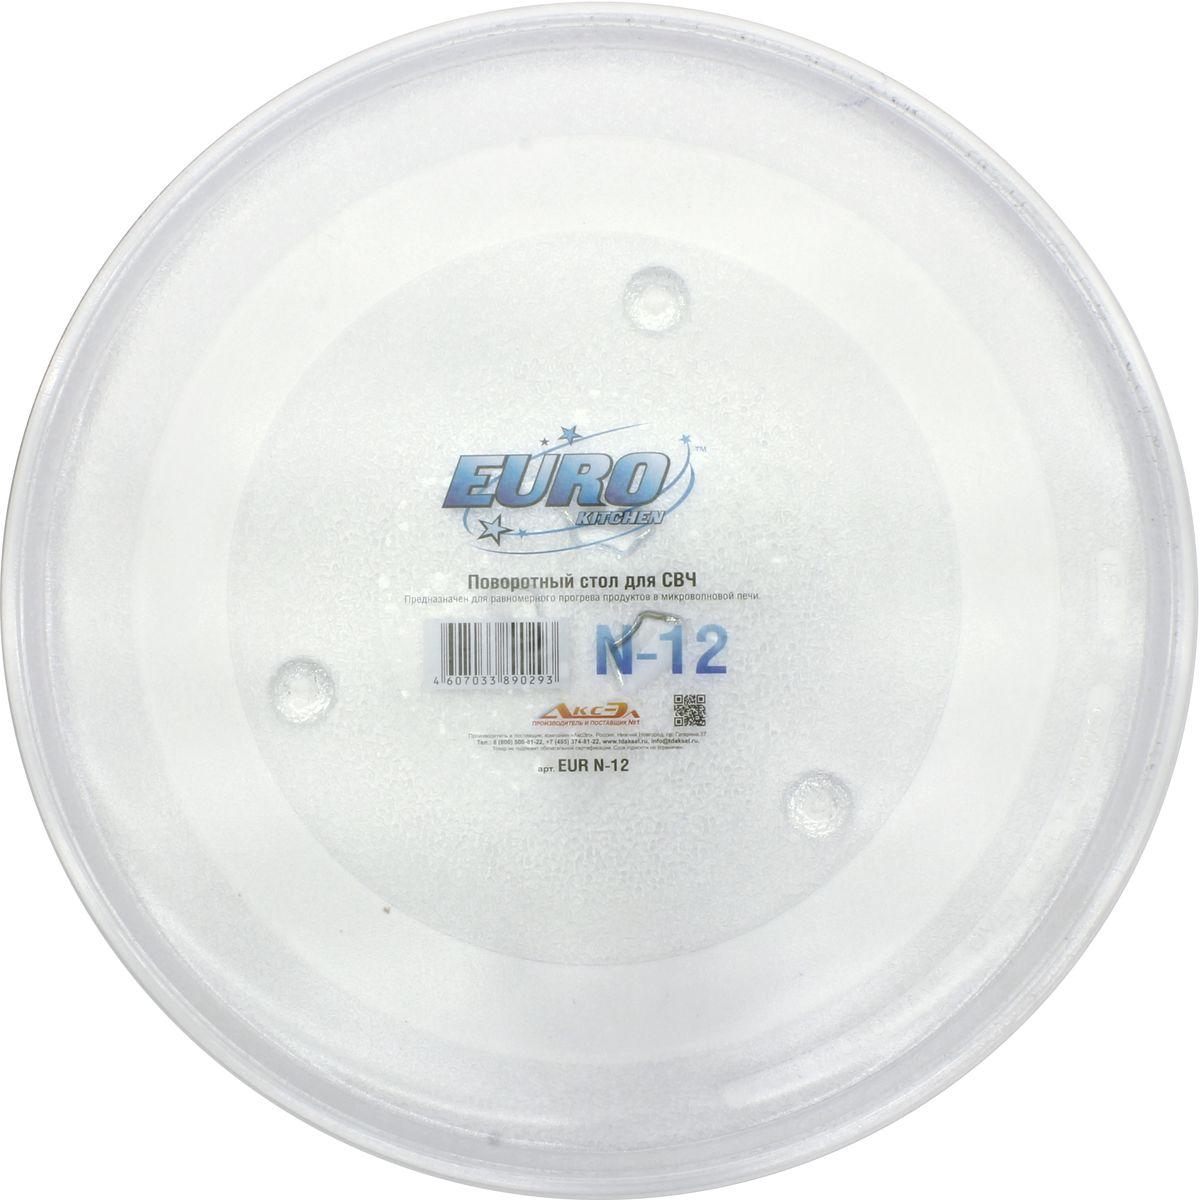 Euro Kitchen N-12 тарелка для СВЧN-12Универсальная тарелка N-12 для микроволновой печи с куплером. Диаметр тарелки 298 мм. Изготовлена из специального жаропрочного стекла. Предназначена для равномерного разогрева продуктов в микроволновой печи. Подходит для брендов: Aeg, Airhot, Amica, Ardo, Ariston, Asko, Atlanta, Aurora, Ava, Barazza, Bauknecht, Bbk, Beko, Bomann, Bork, Bosch, Brandt, Candy, Cata, Centek, Clatronic, Daewoo, De dietrich, Delfa, Electrolux, Elenberg, Ergo, Erisson, Eurotec, Fagor, Fimar, Foster, Franke, Fulgor, Fusion, Gaggenau, Gastrorag, Goldstar, Gorenje, Hankel, Hansa, Hilton, Horizont, Hurakan, Hyundai, Ilve, Indesit, Kaiser, Kenmore, Kenwood, Korting, Kuppersberg, Kuppersbusch, Kamark, Keran, Lg, Liberton, Liberty, Maxwell, Menumaster, Midea, Miele, Moulinex, Mystery, Neff, Oursson, Panasonic, Proficook, Rainford, Redmond, Rolsen, Samsung, Saturn, Scarlett, Sencor, Sharp, Siemens, Simfer, Sinbo, Sirman, Smeg, Supra, Teka, Thomson, Toshiba, V-zug, Vasko, Vimar, Vitek, Vr, Weissgauff,...